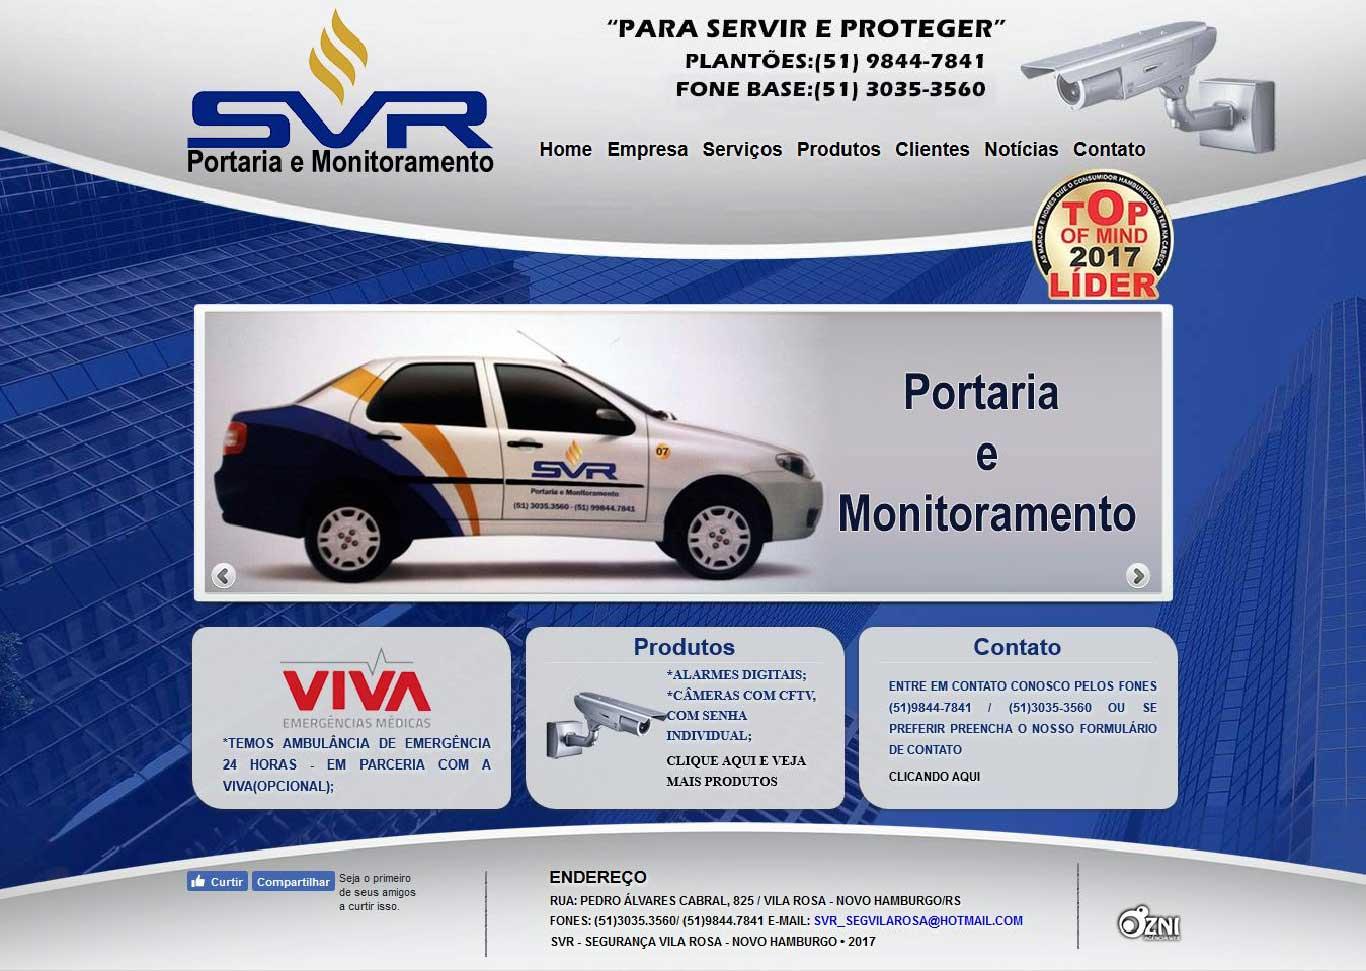 SVR Monitoramento